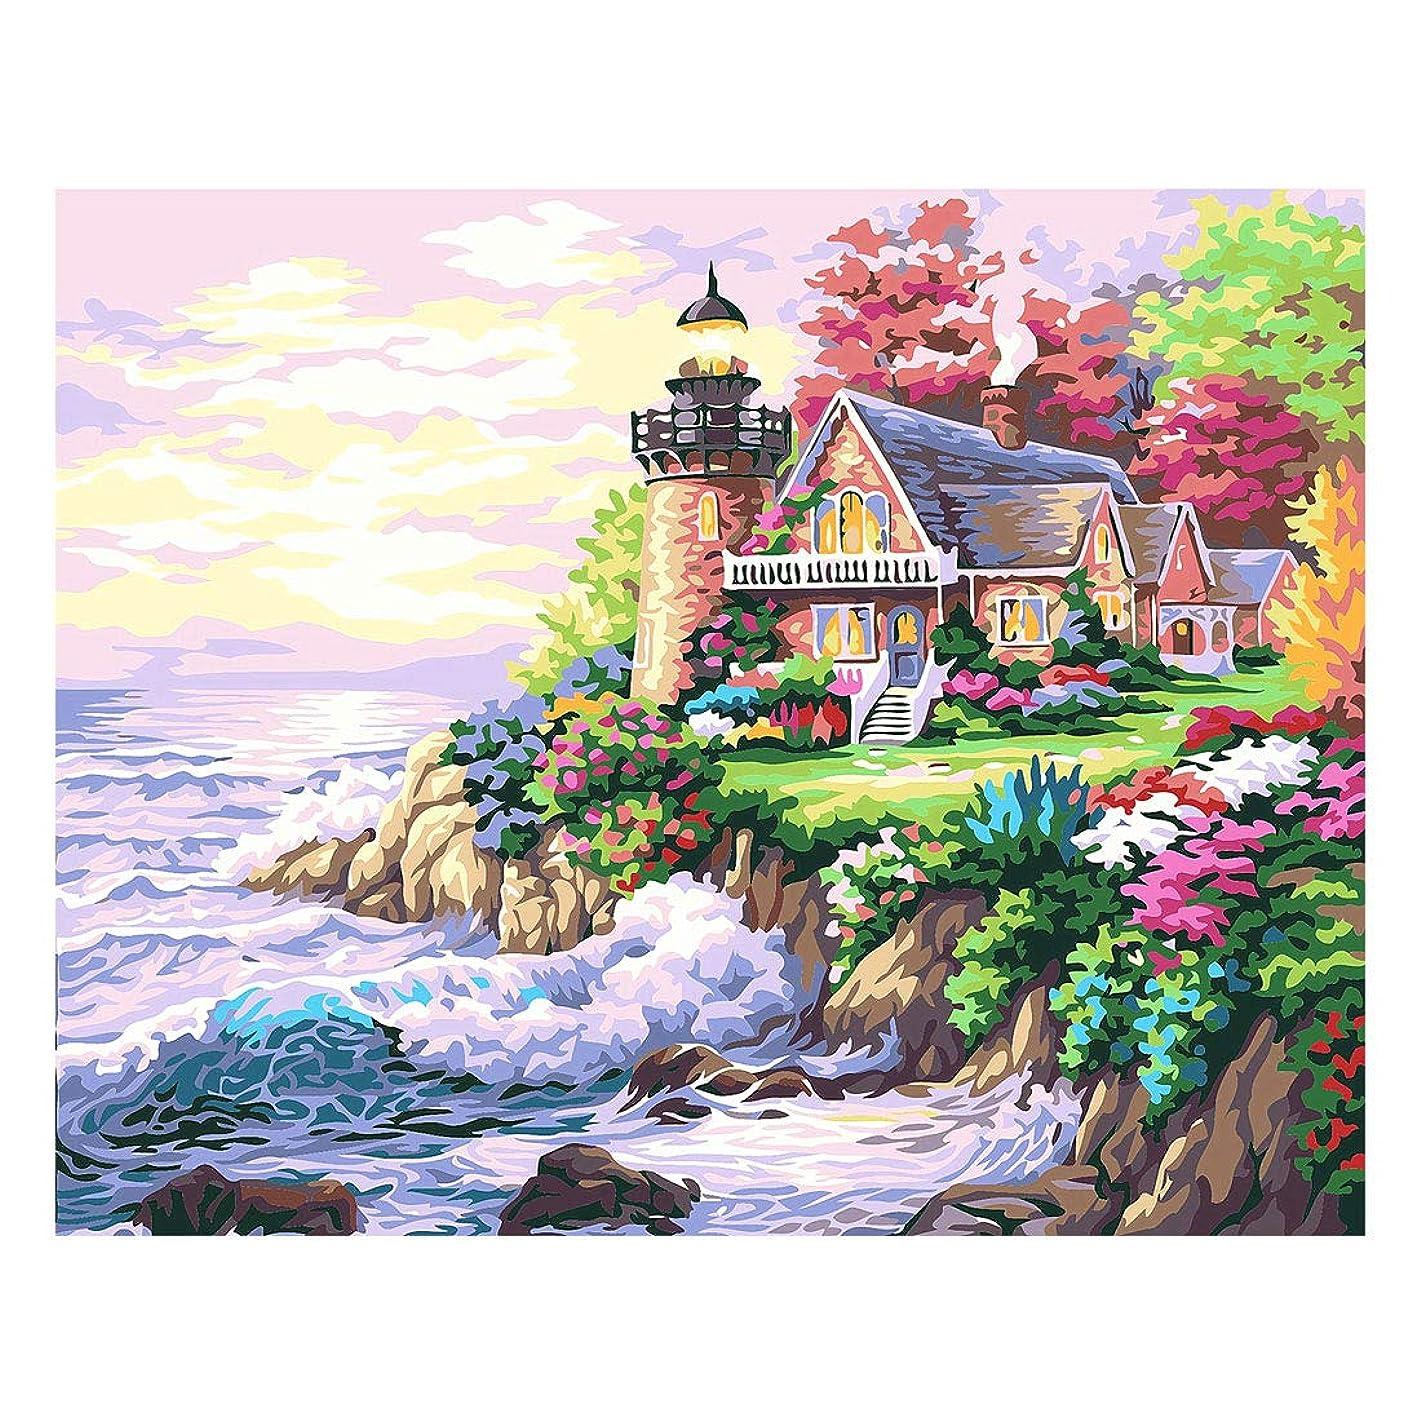 Horseben Art DIY Oil Painting Paint by Numbers kit for Adults Kids Beginner 16x20 Inch (Seaside House) (Frameless)